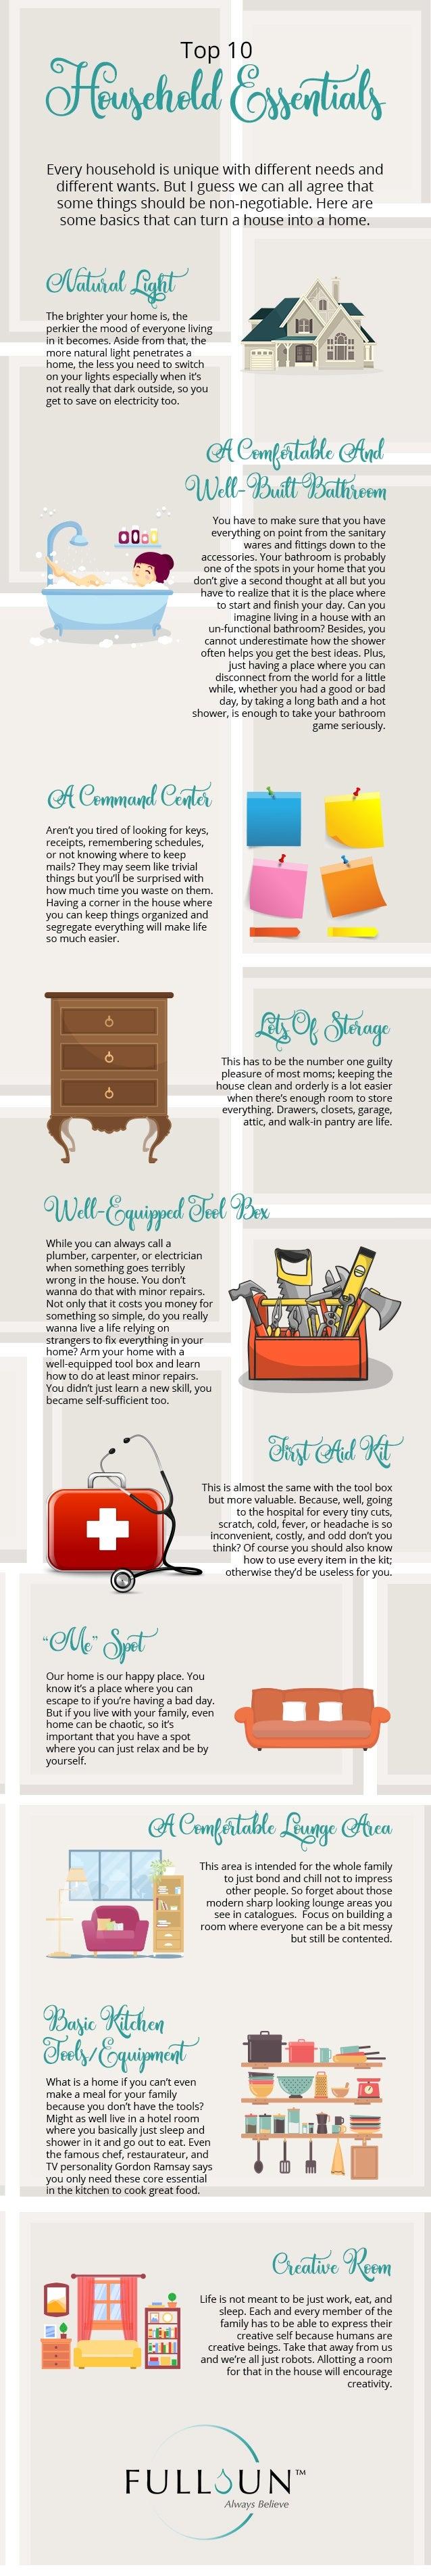 Top 10 Household Essentials